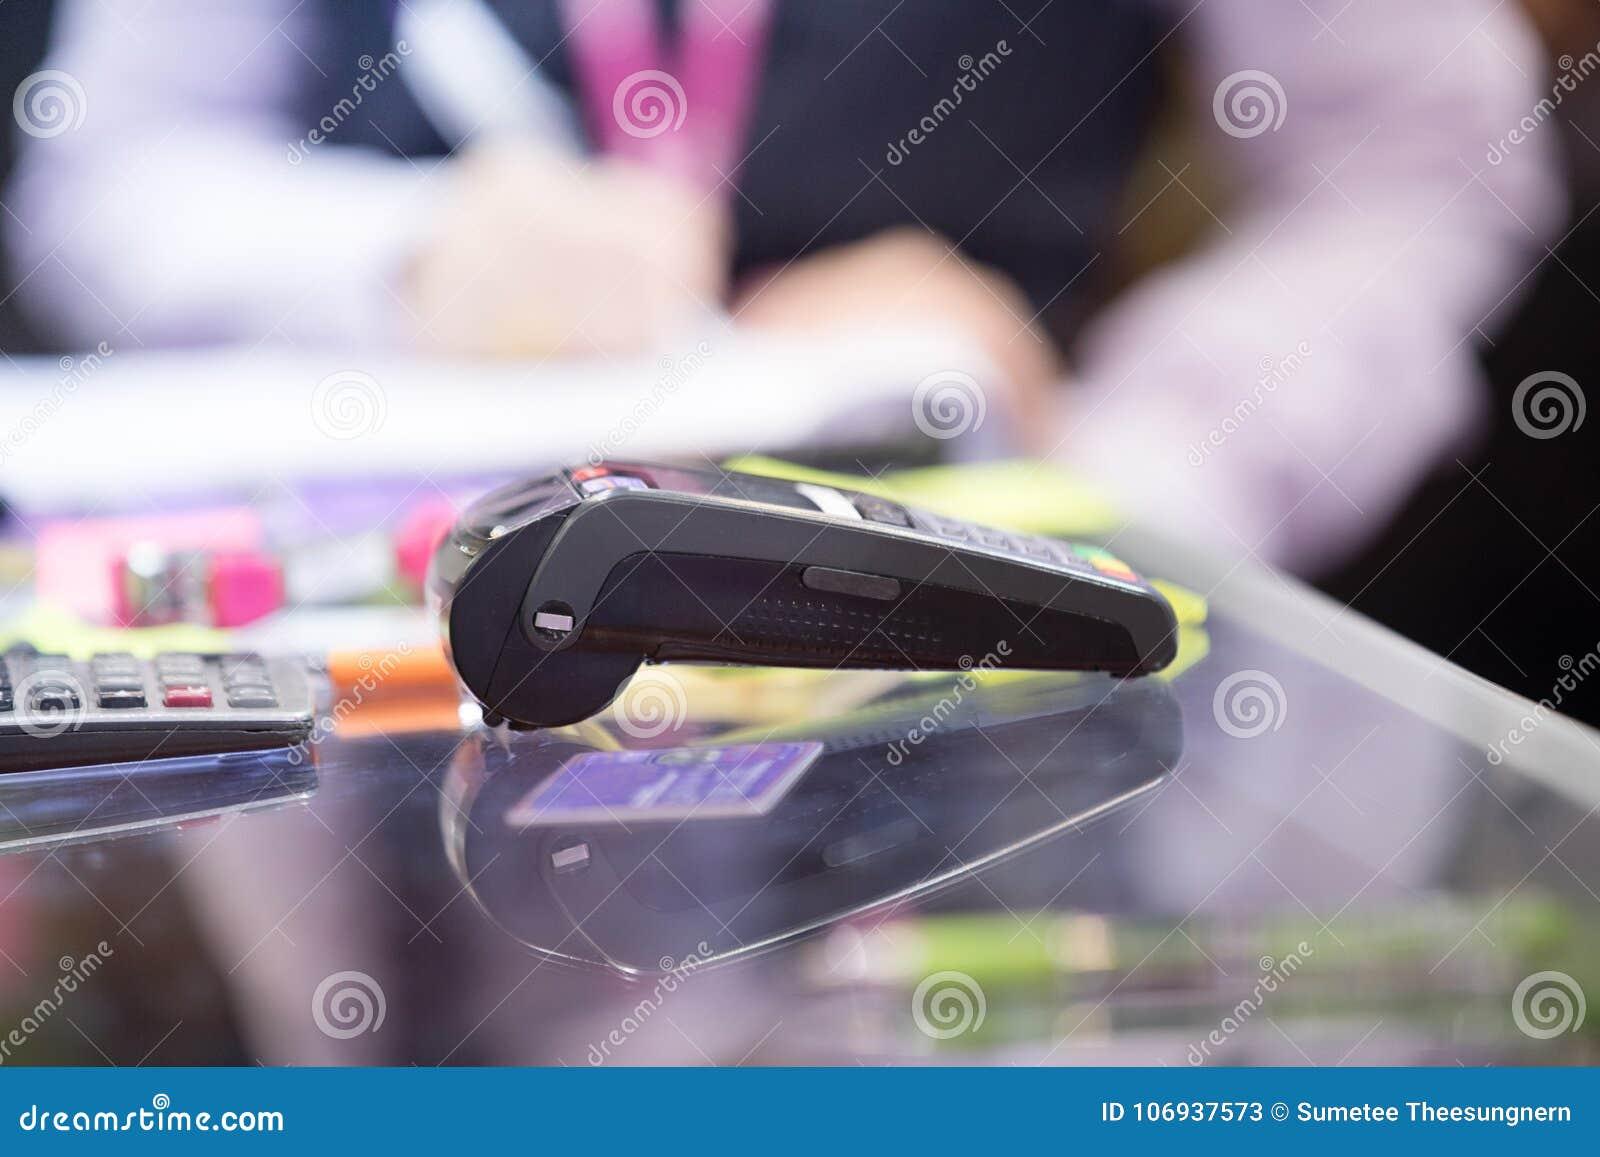 Asian Business Women Hand Using Credit Card Swiping Machine For ...